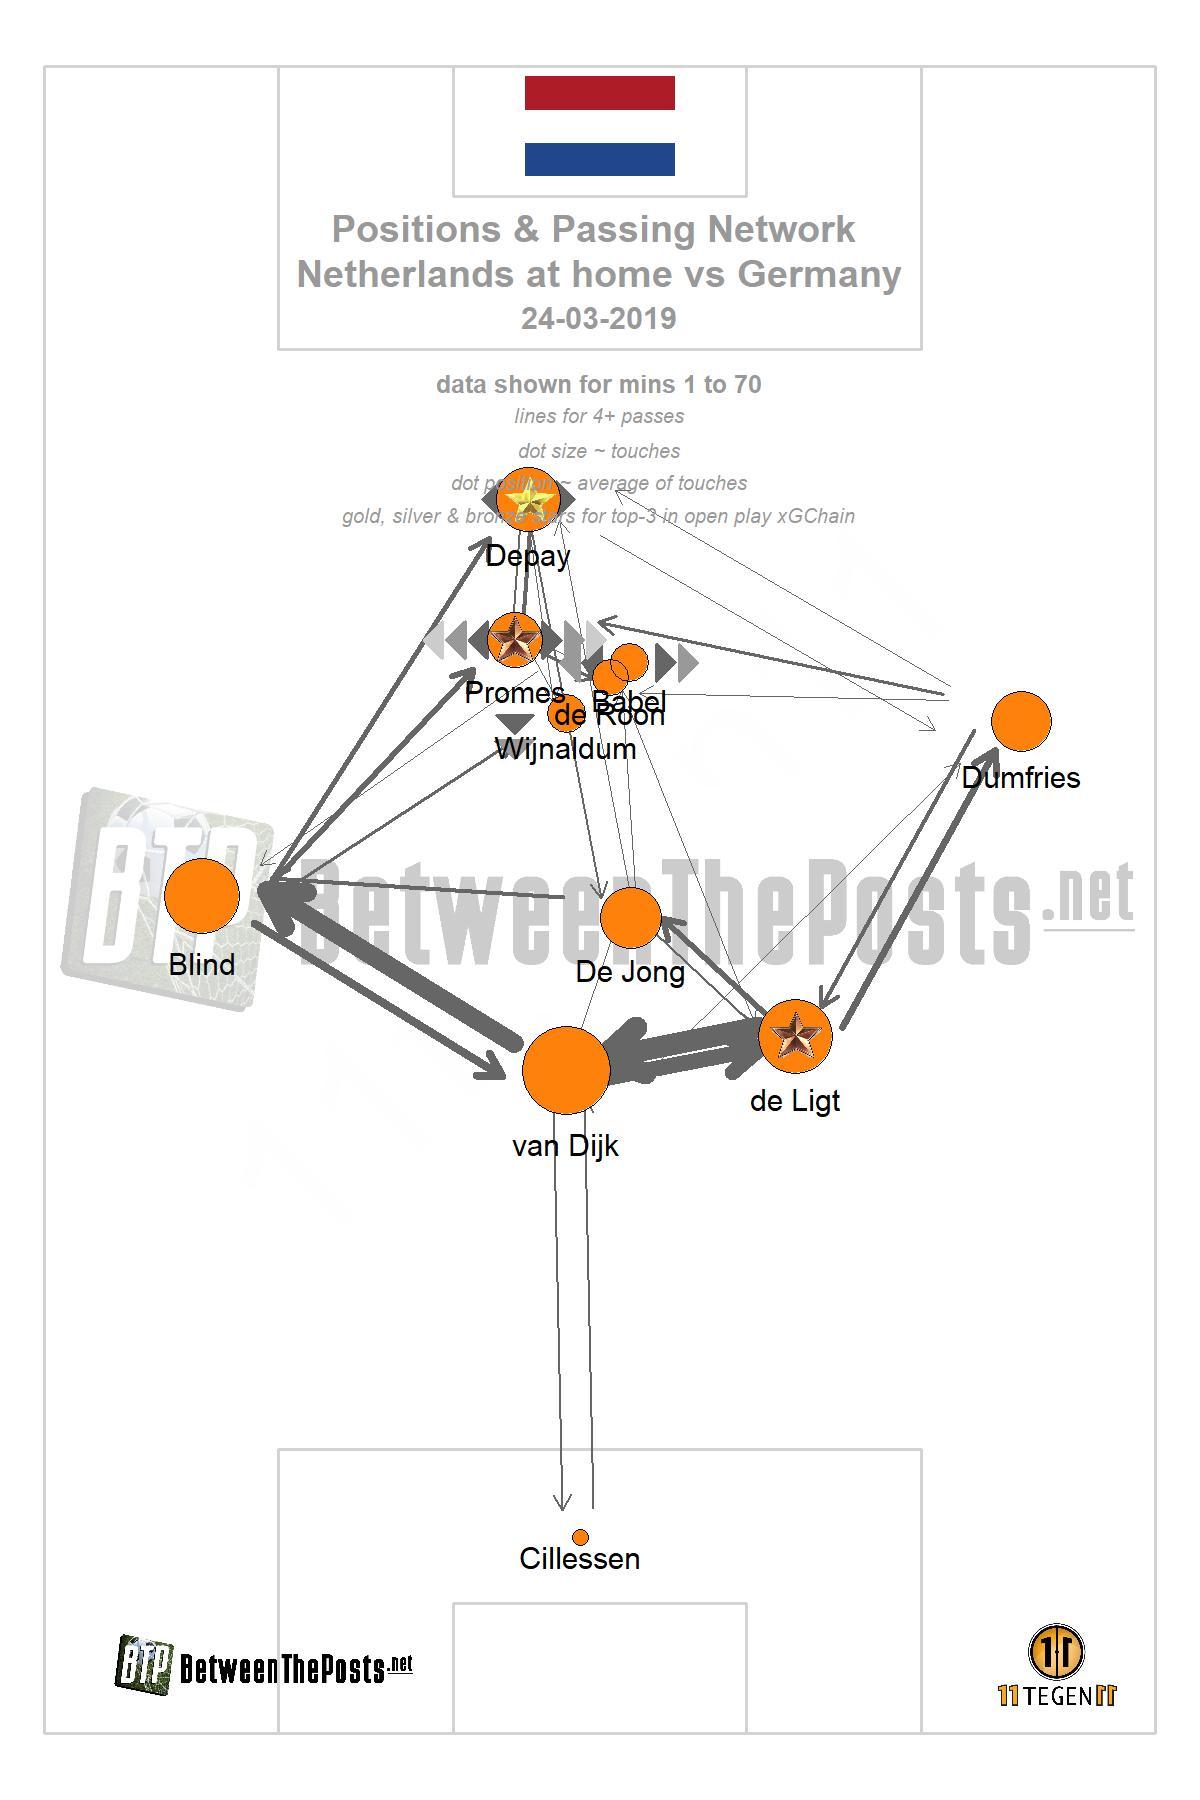 Passmap Netherlands - Germany 2-3 European Championship Qualifiers